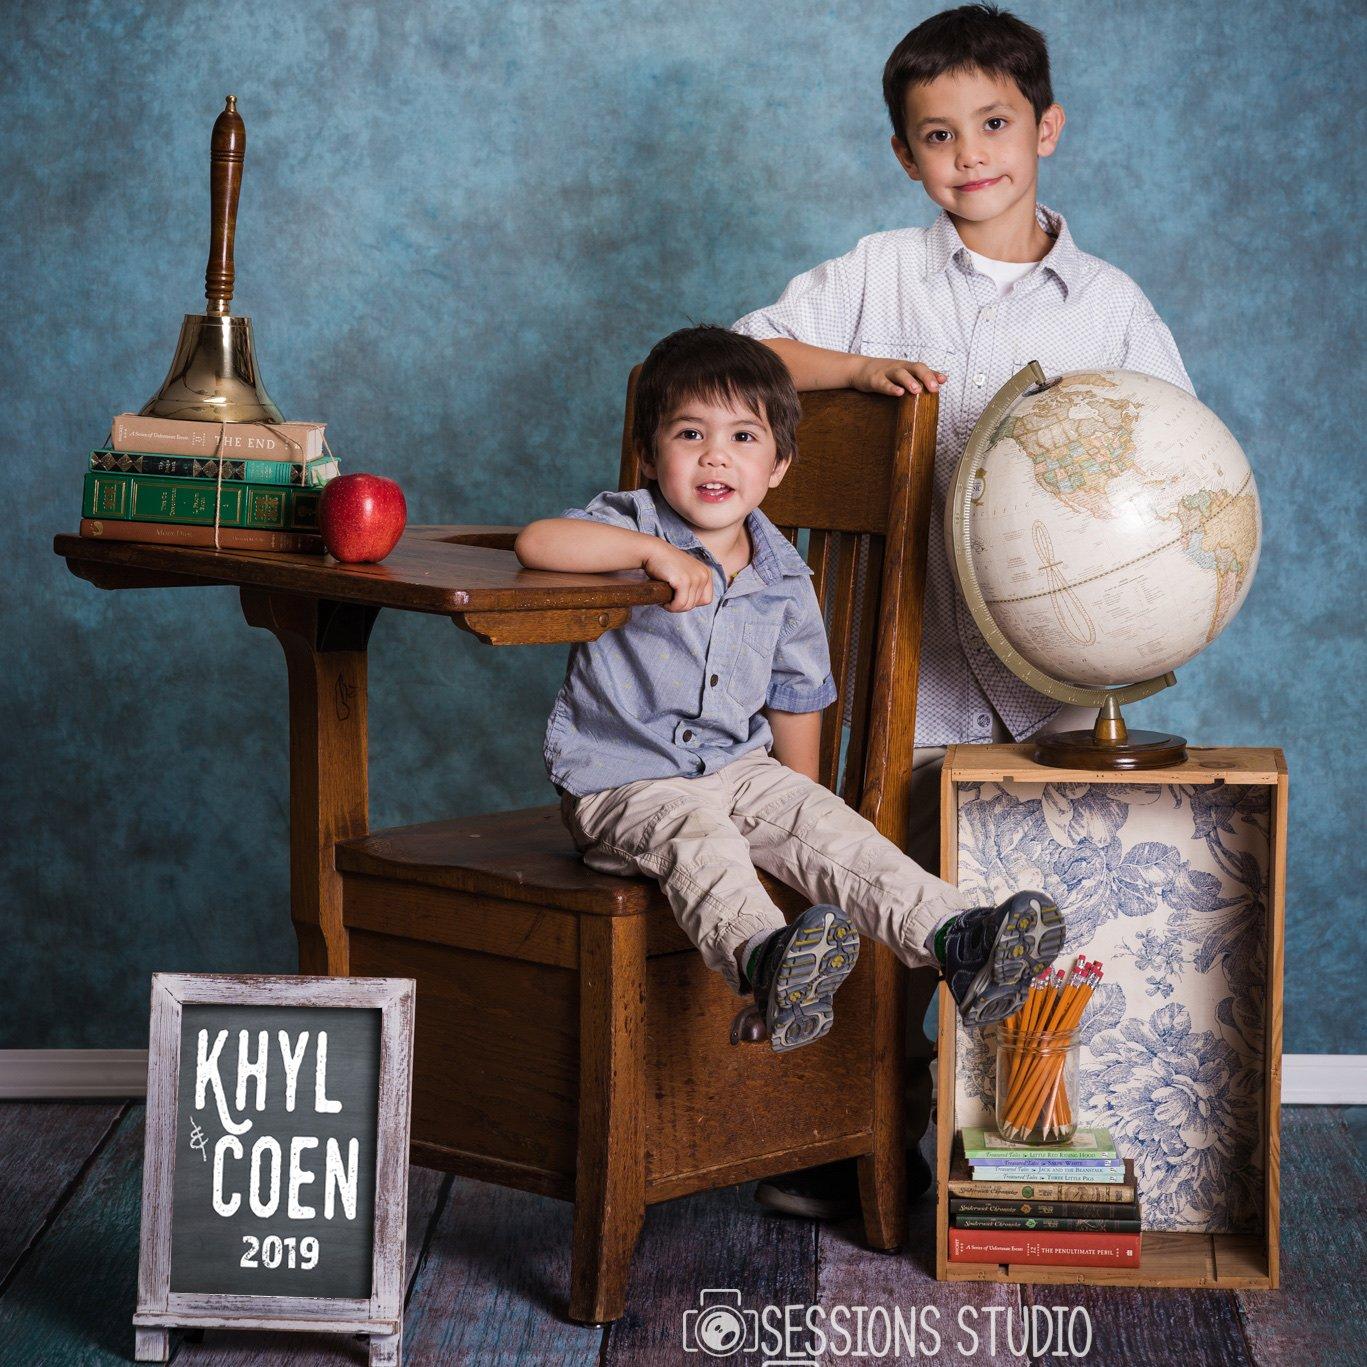 KhylCoen01